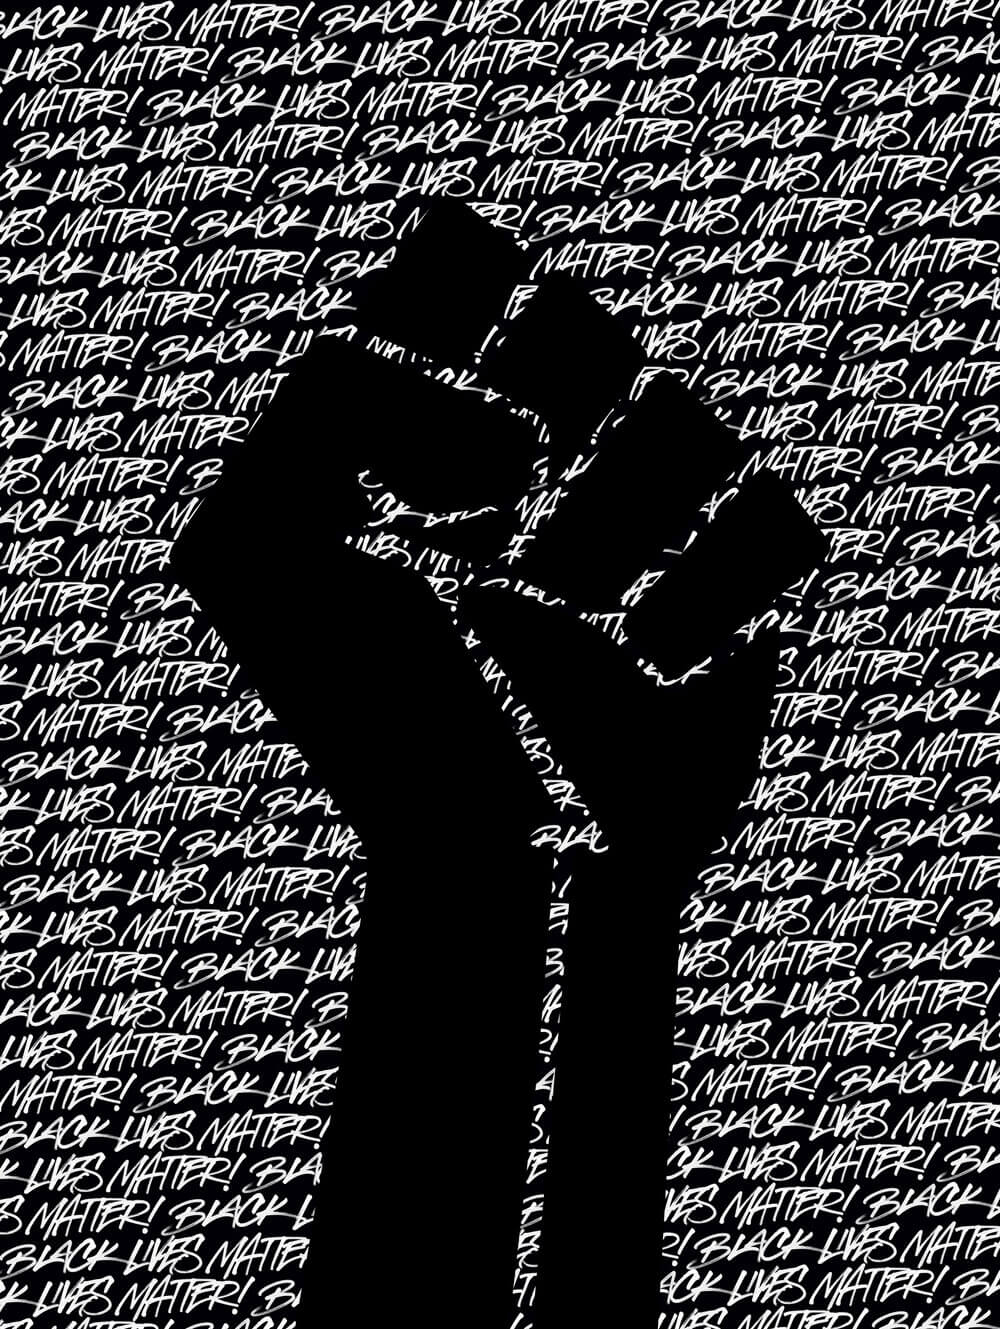 Black Lives Matter (series, 1/2) main image